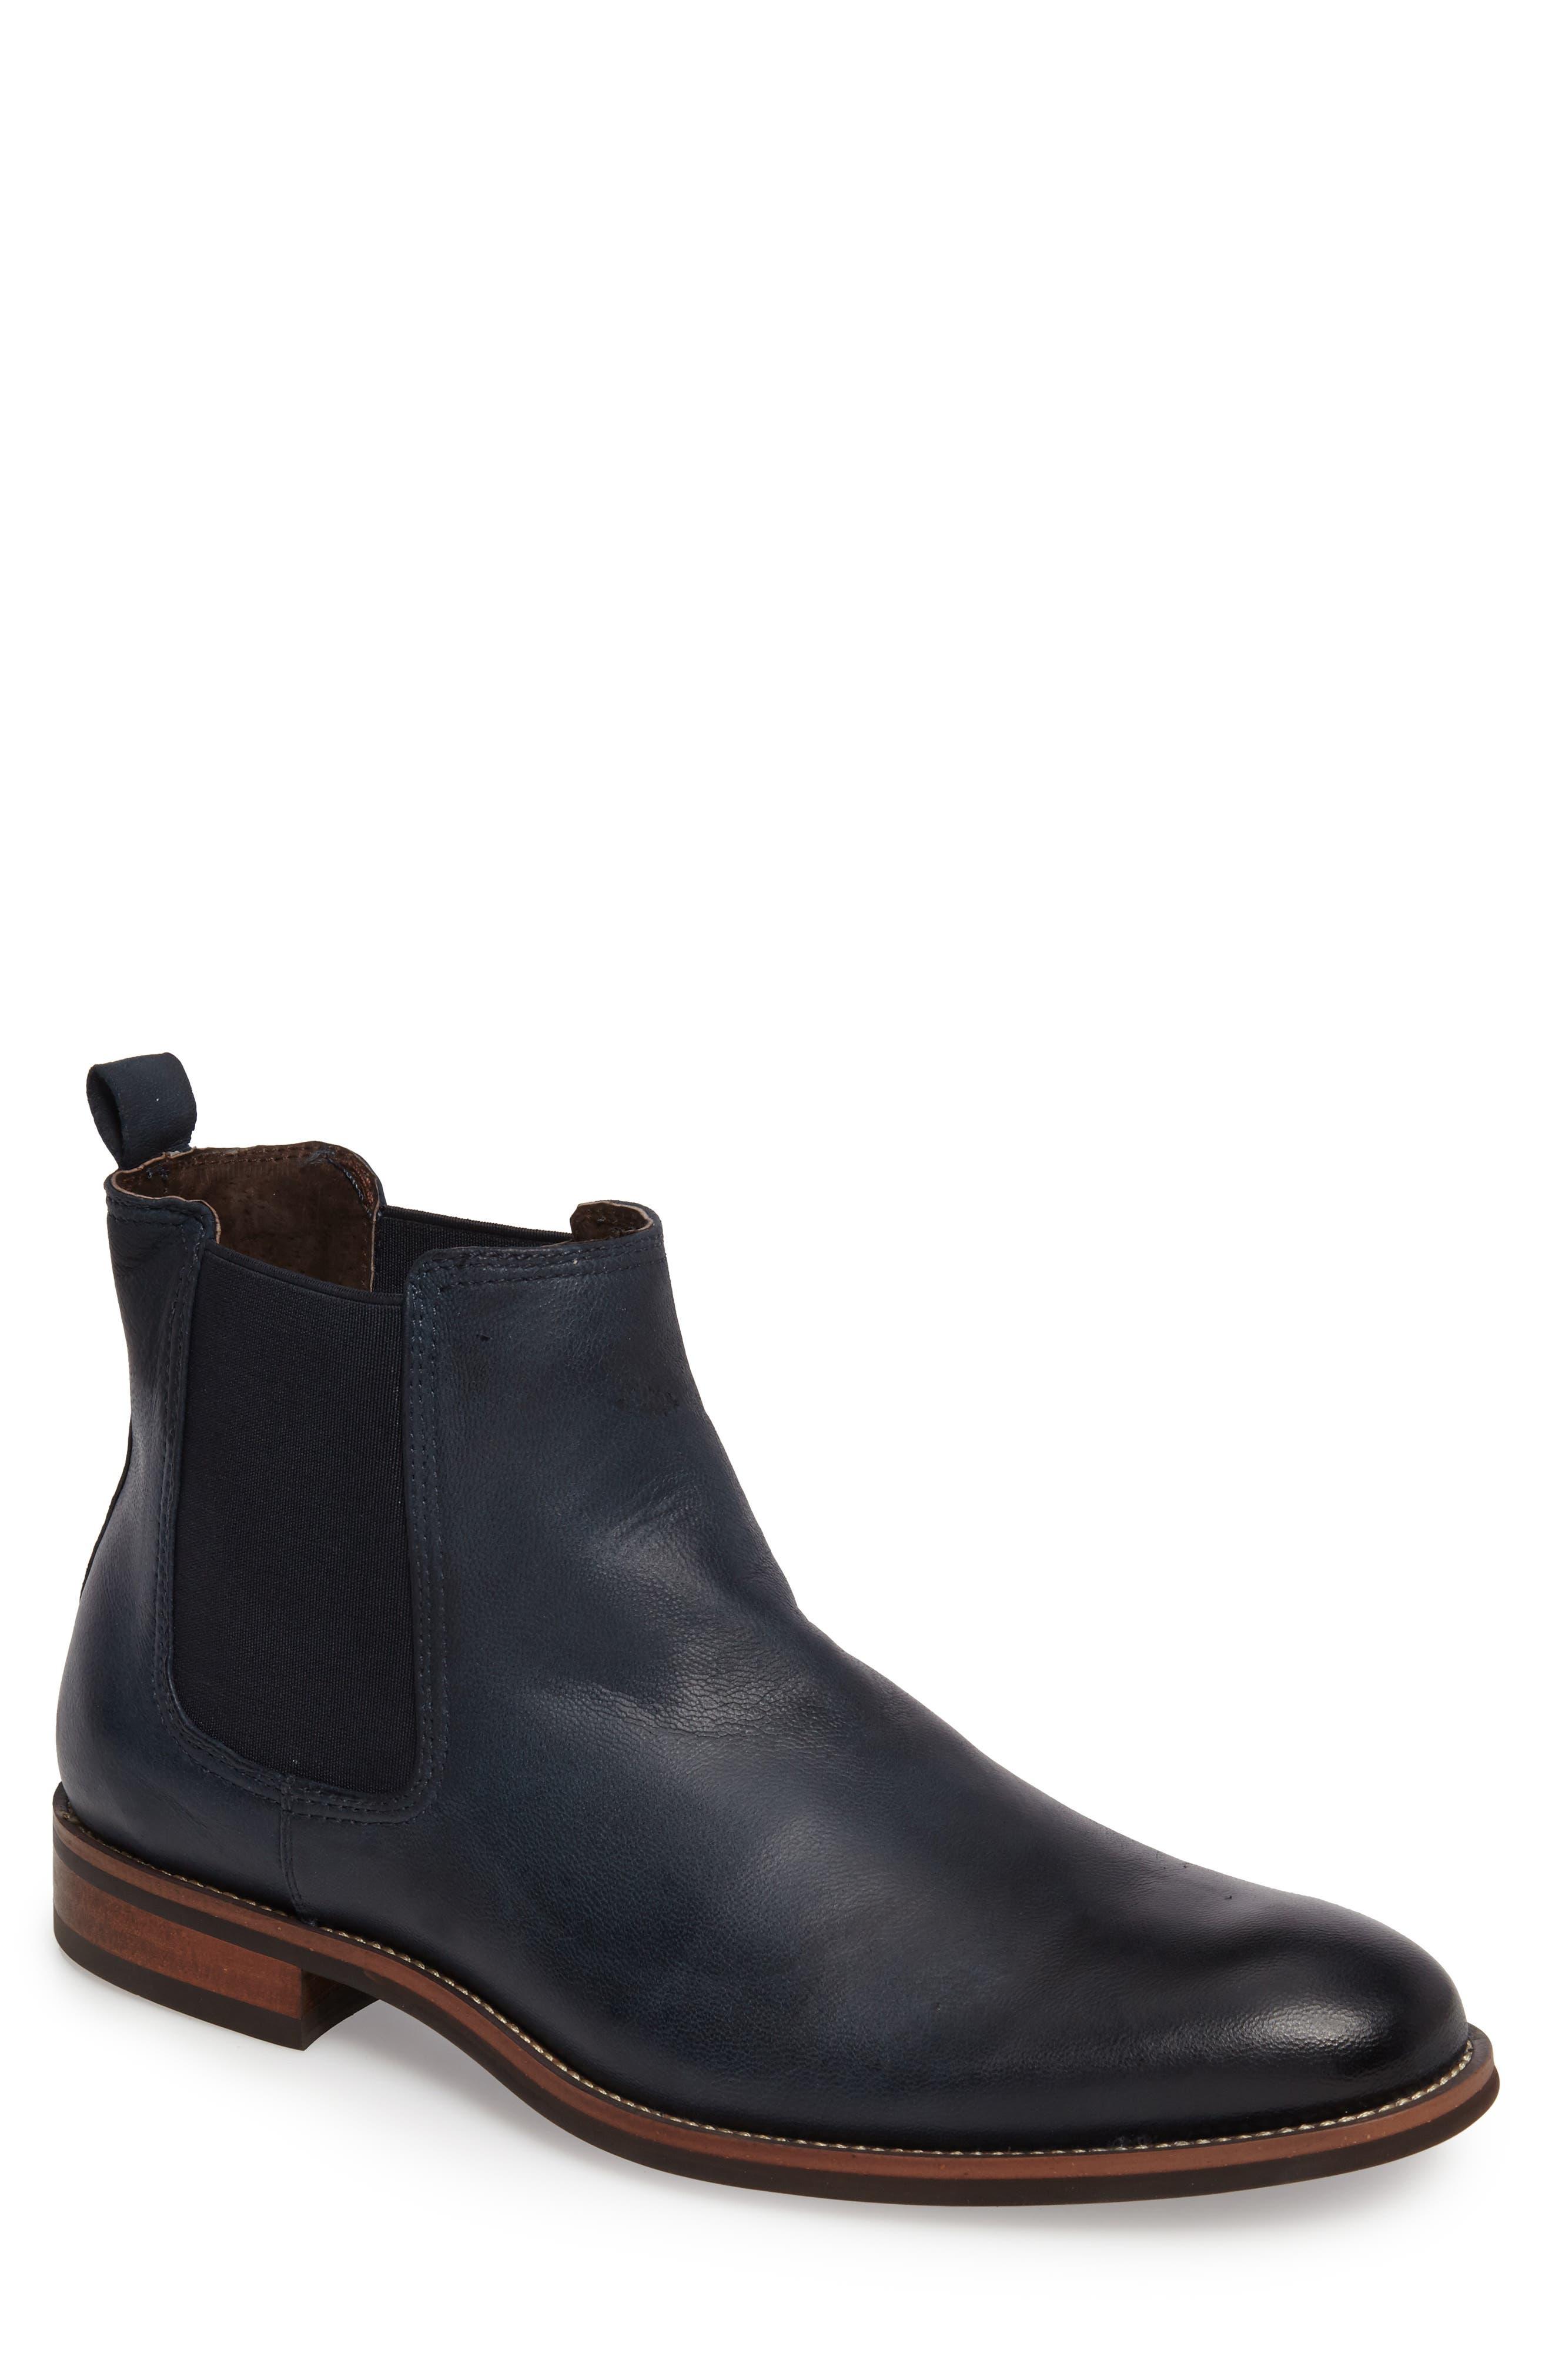 Jump Men's Lawson Chelsea Boot OwK98d